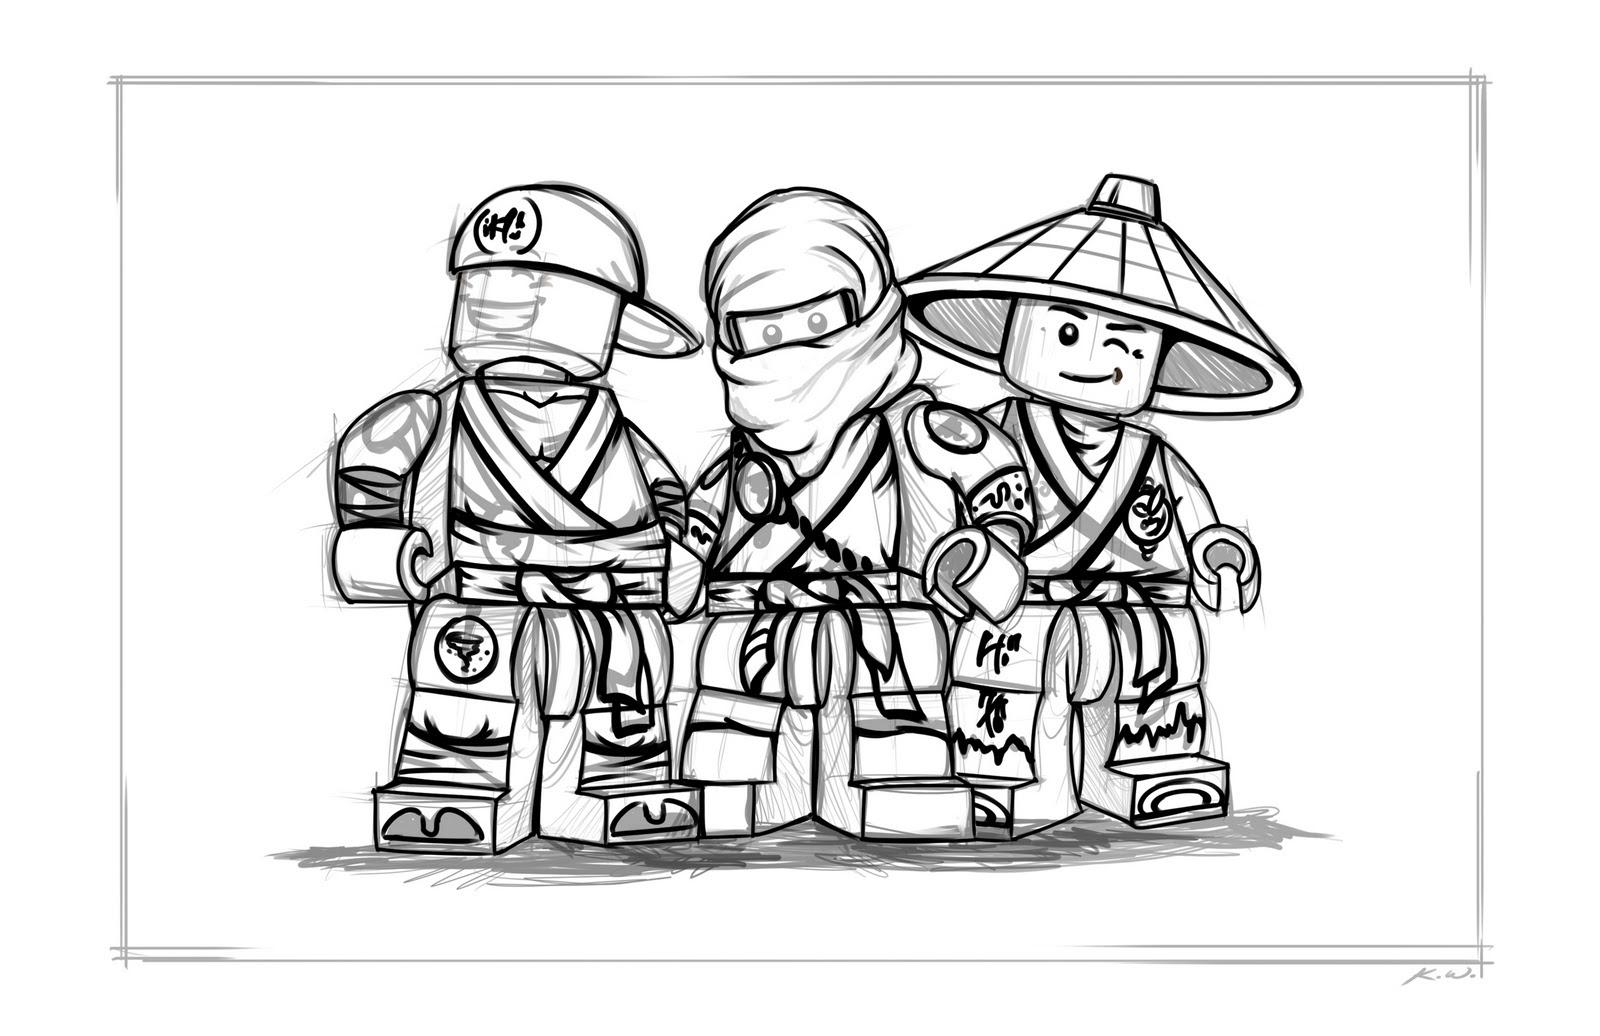 - Free Printable Lego Ninjago Coloring Pages Coloring Home